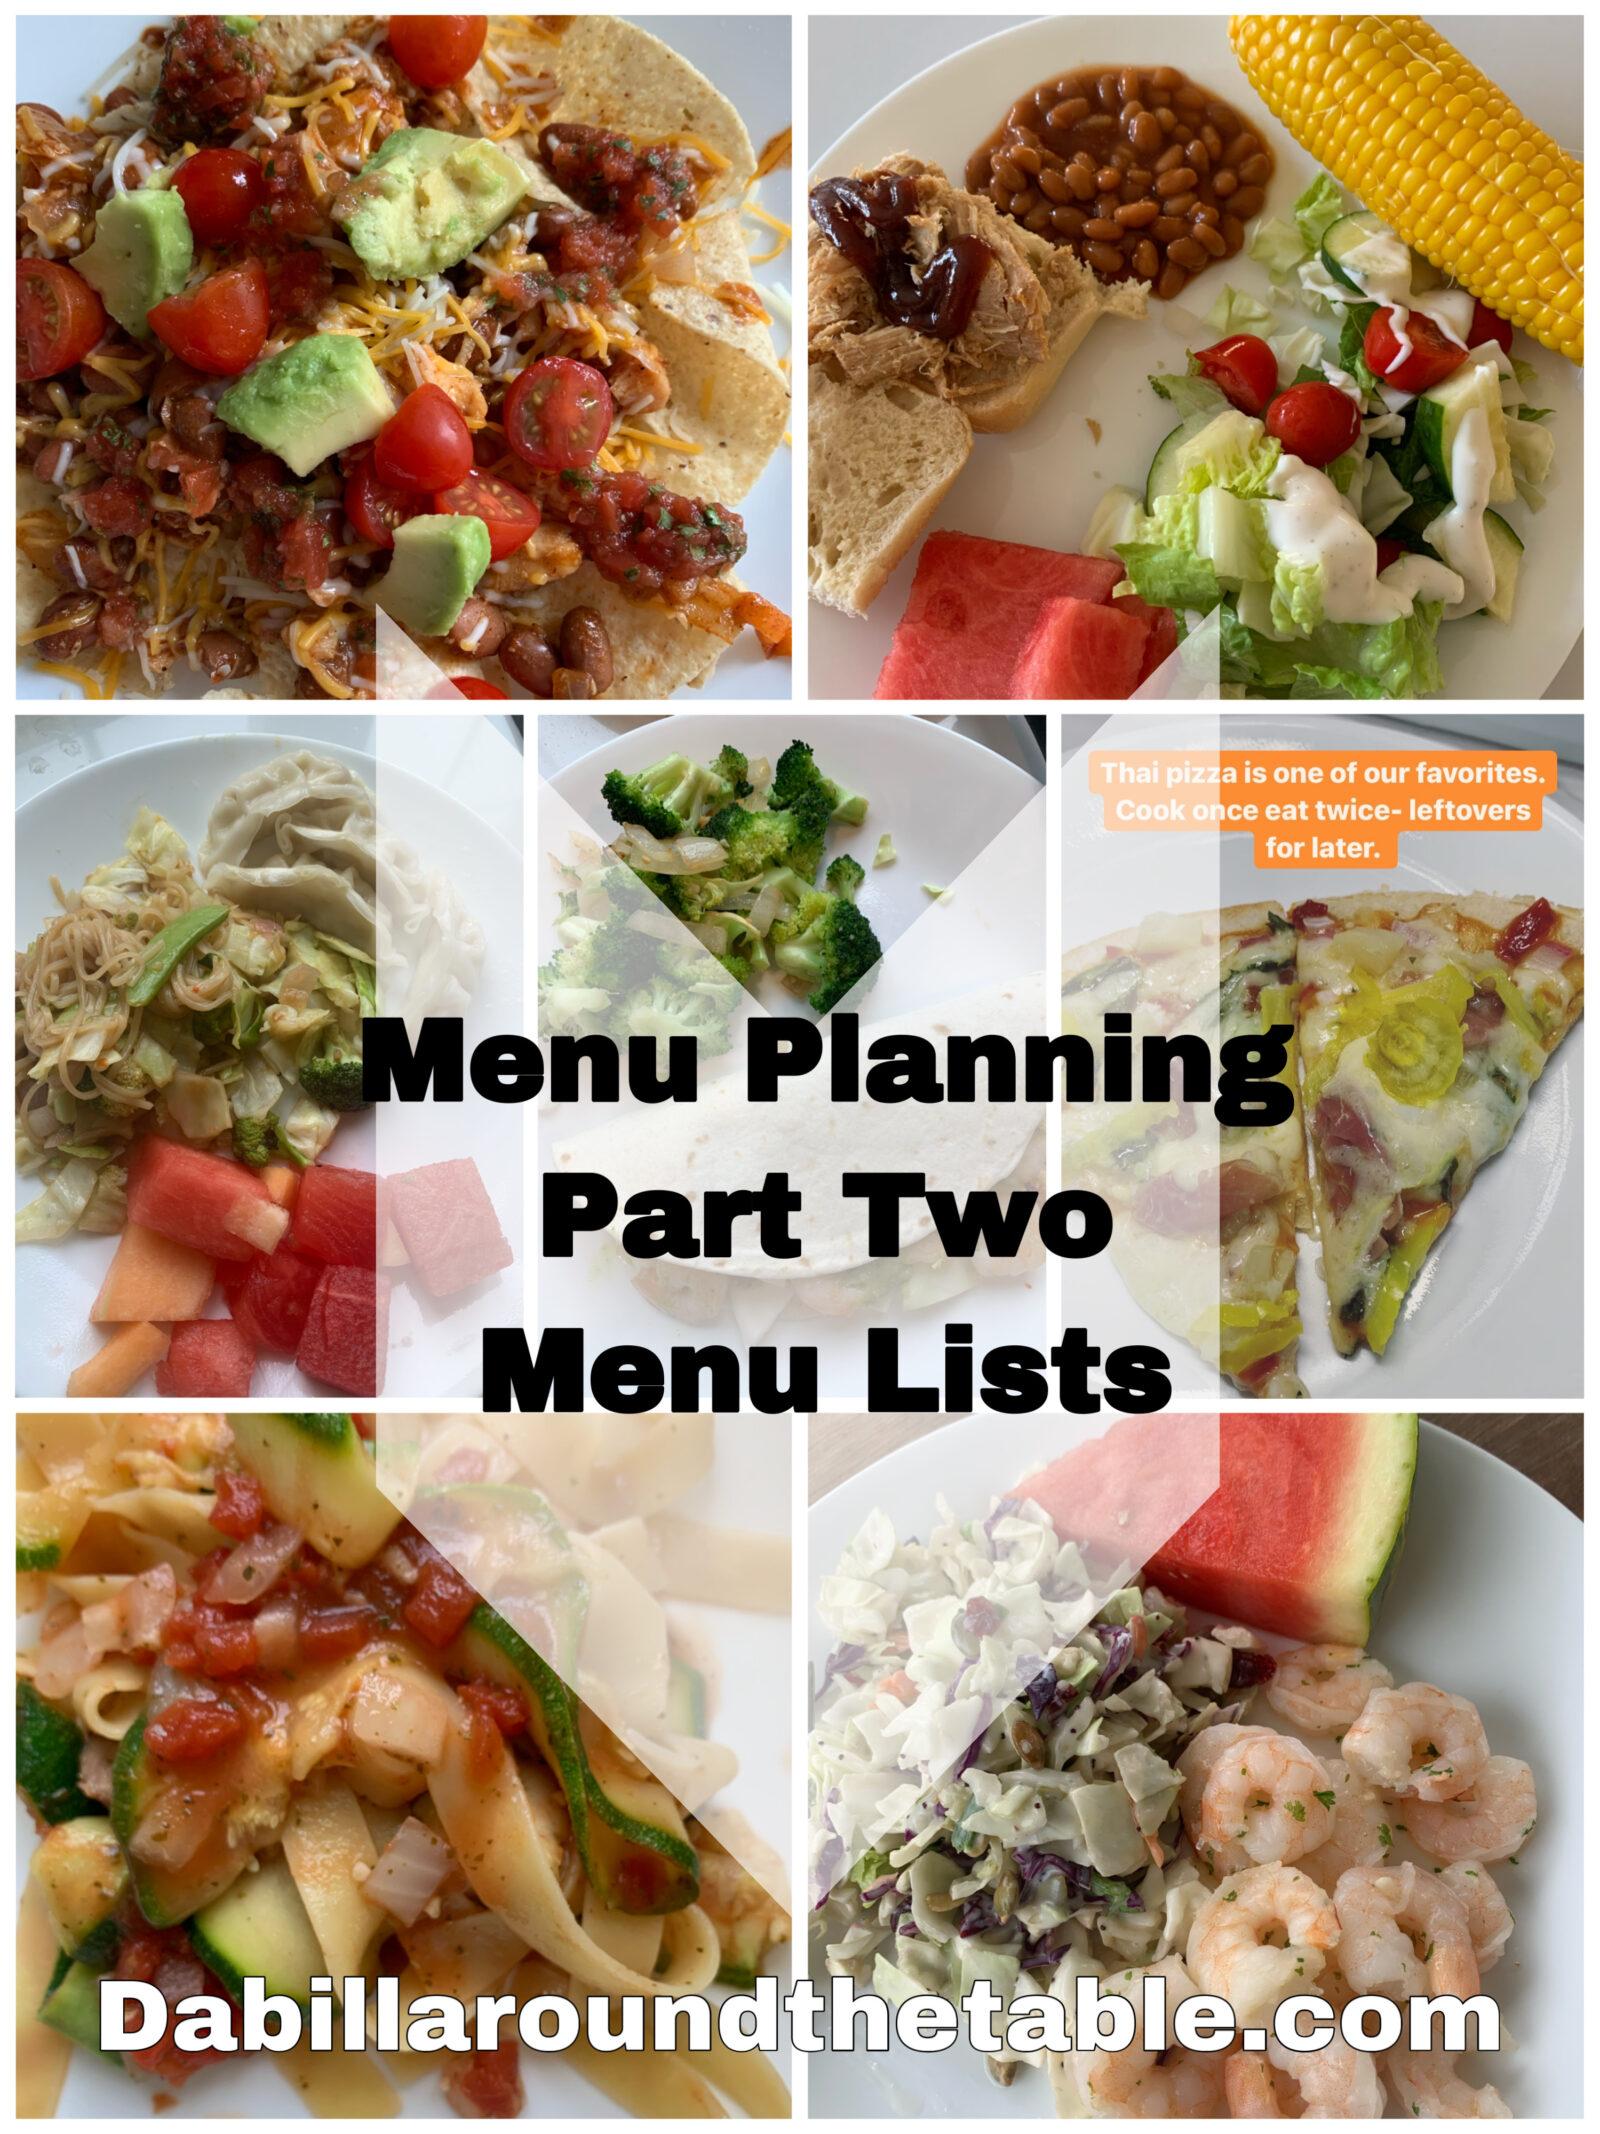 Menu Planning Part two